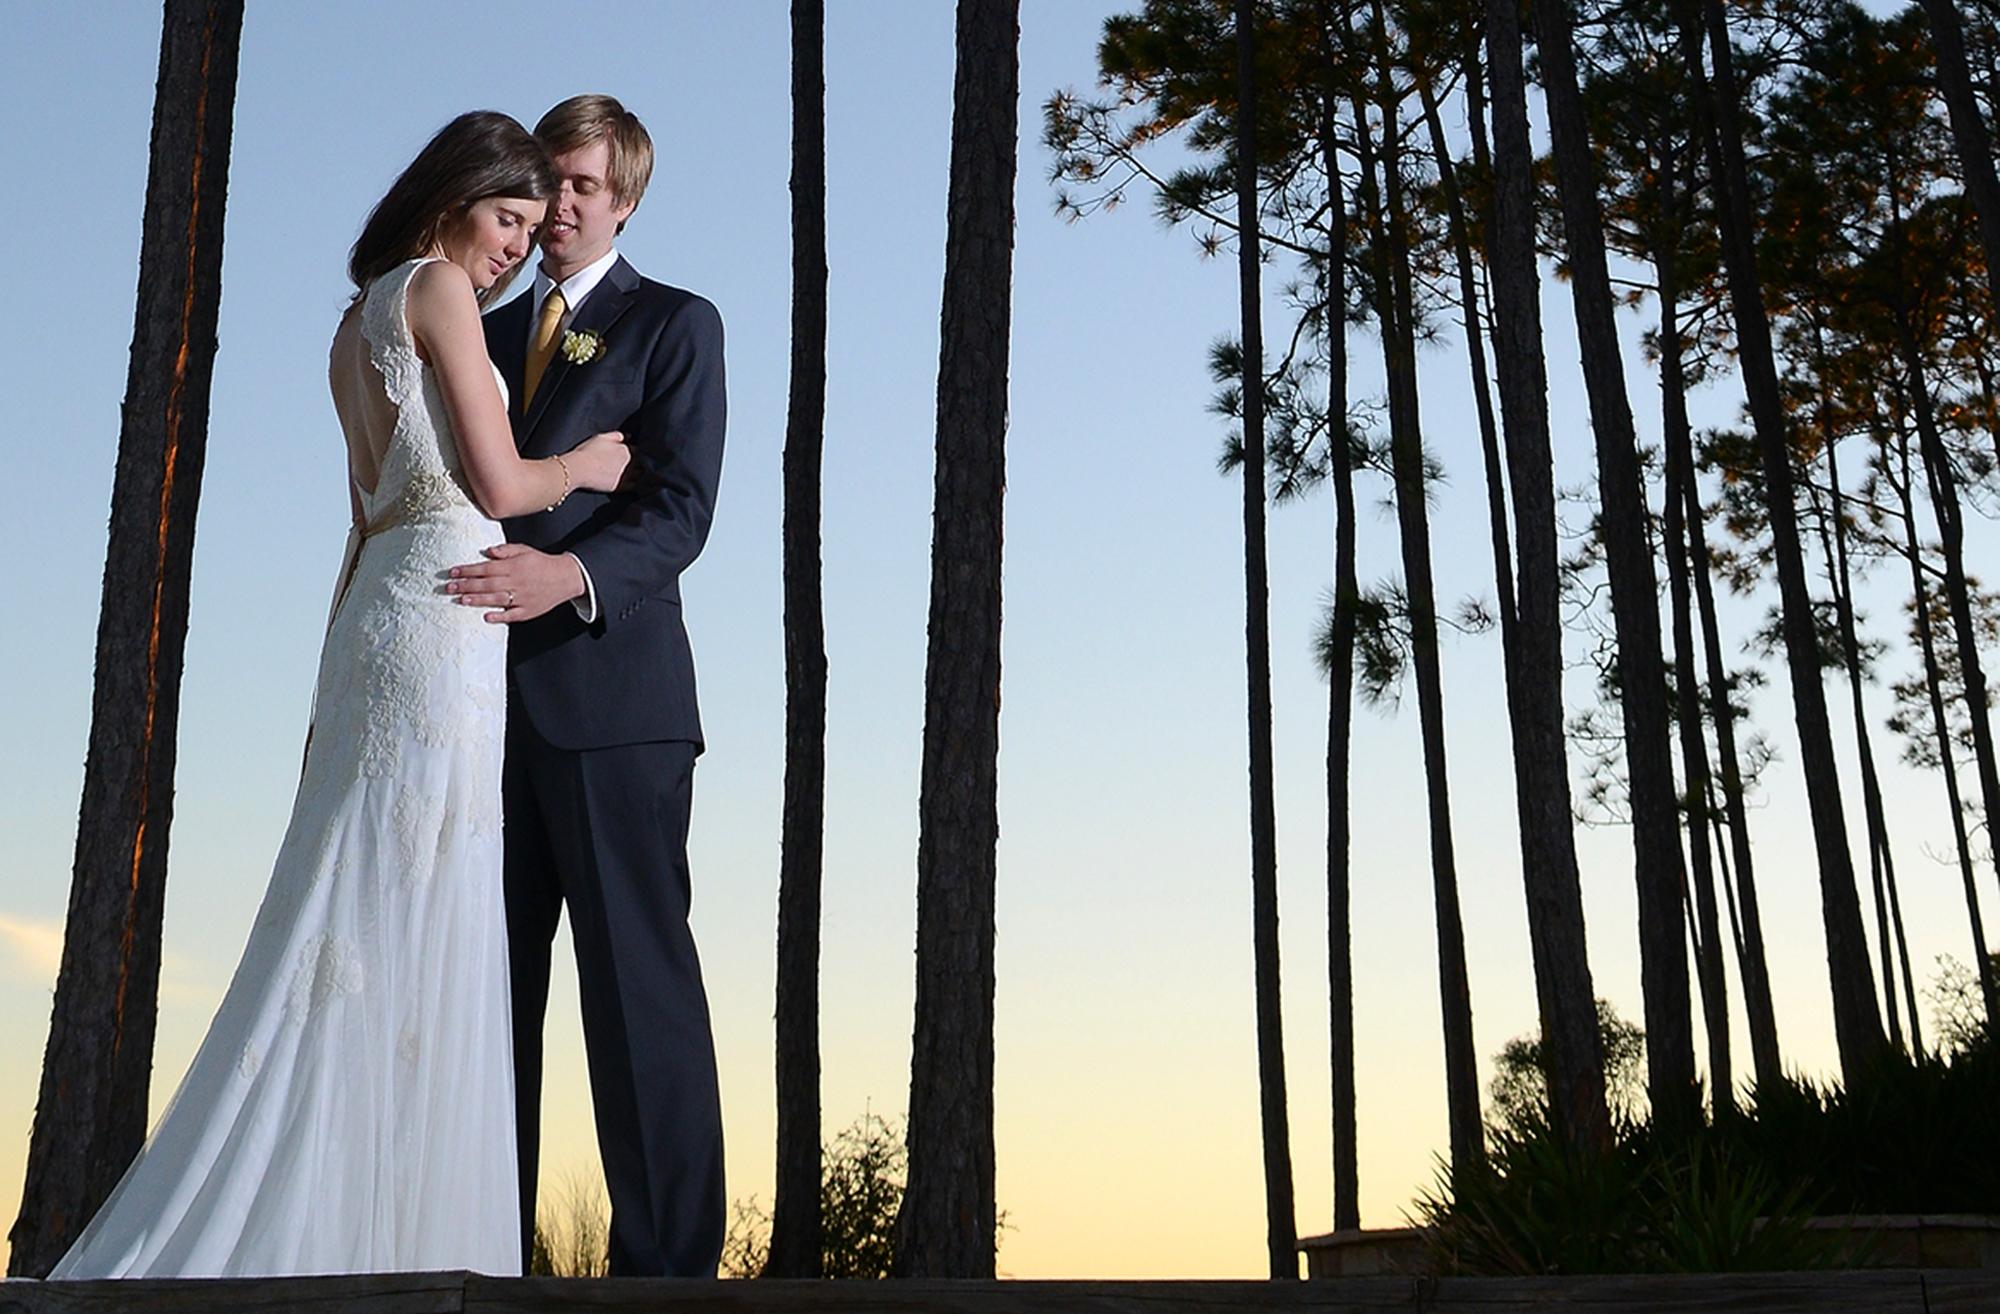 Wedding Photography Panama City Beach: Panama City Wedding Photographer